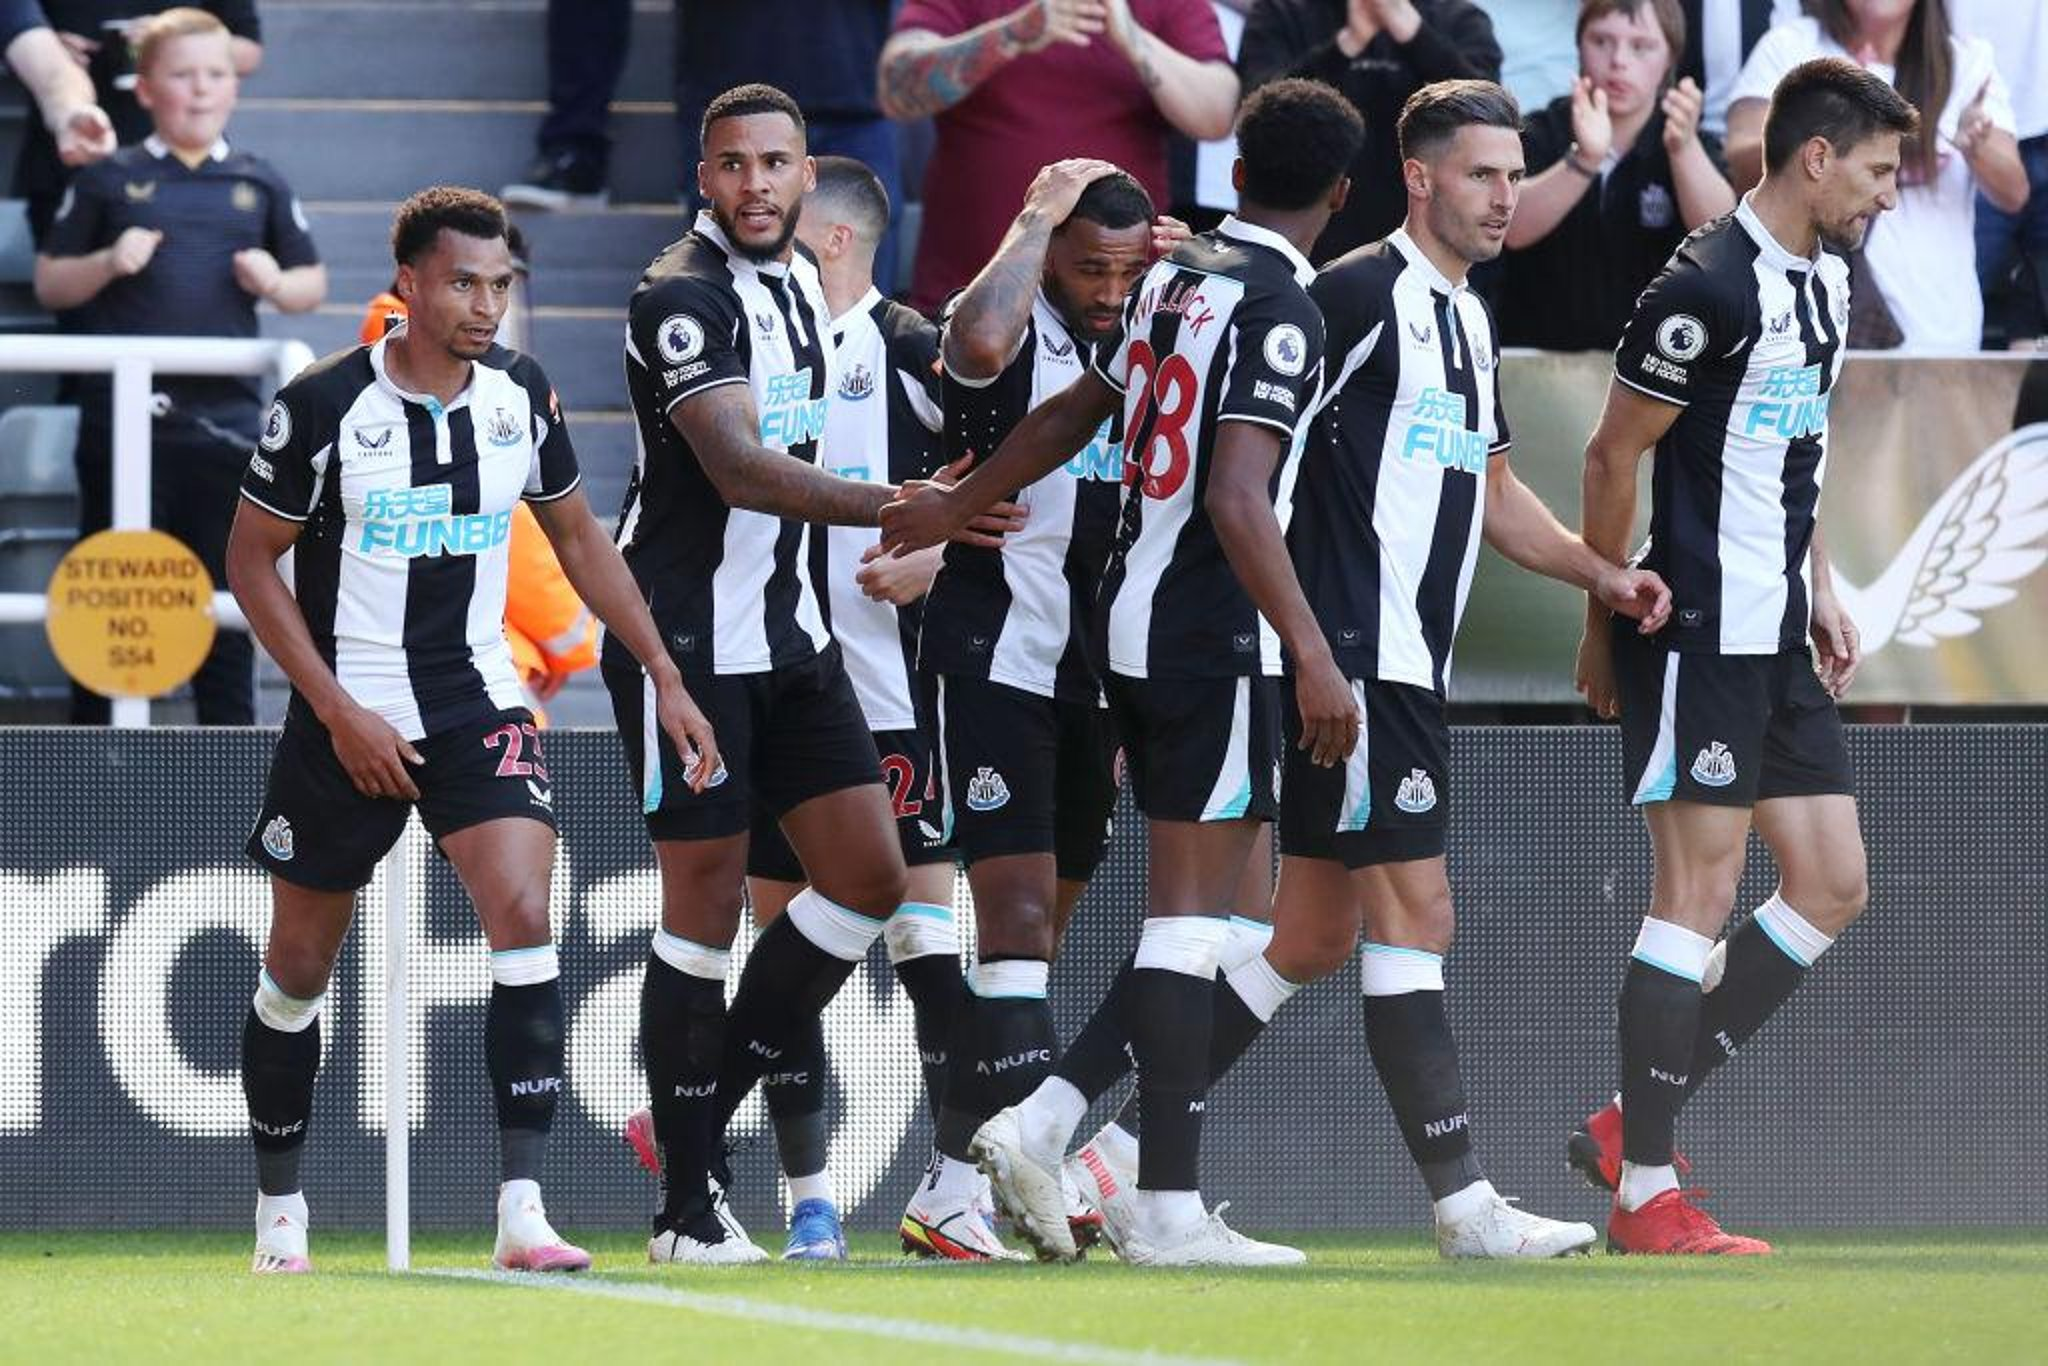 Wolverhampton Wanderers Vs Newcastle Kick-Off, Date, Prediction & Live Stream